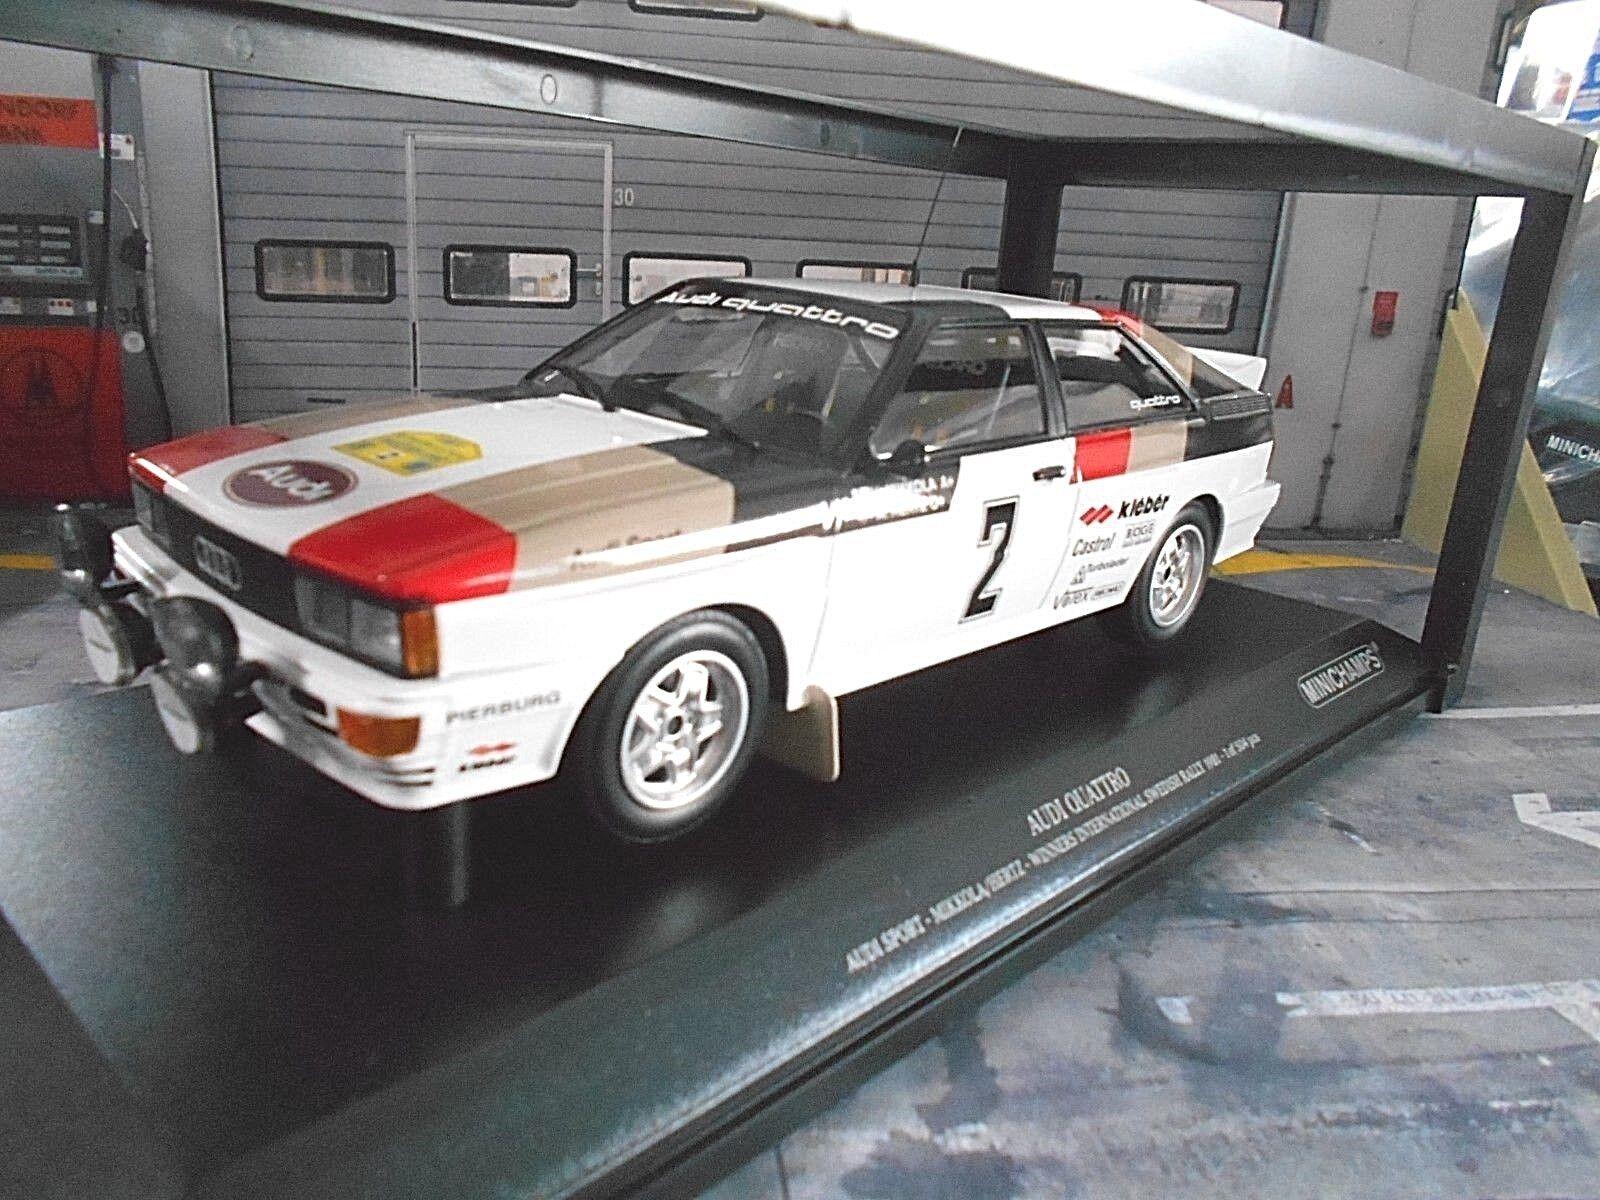 AUDI QUATTRO RALLYE taille 4 Suède coupe du monde 1981  2 Mikkola Hertz WIN MINICHAMPS 1 18